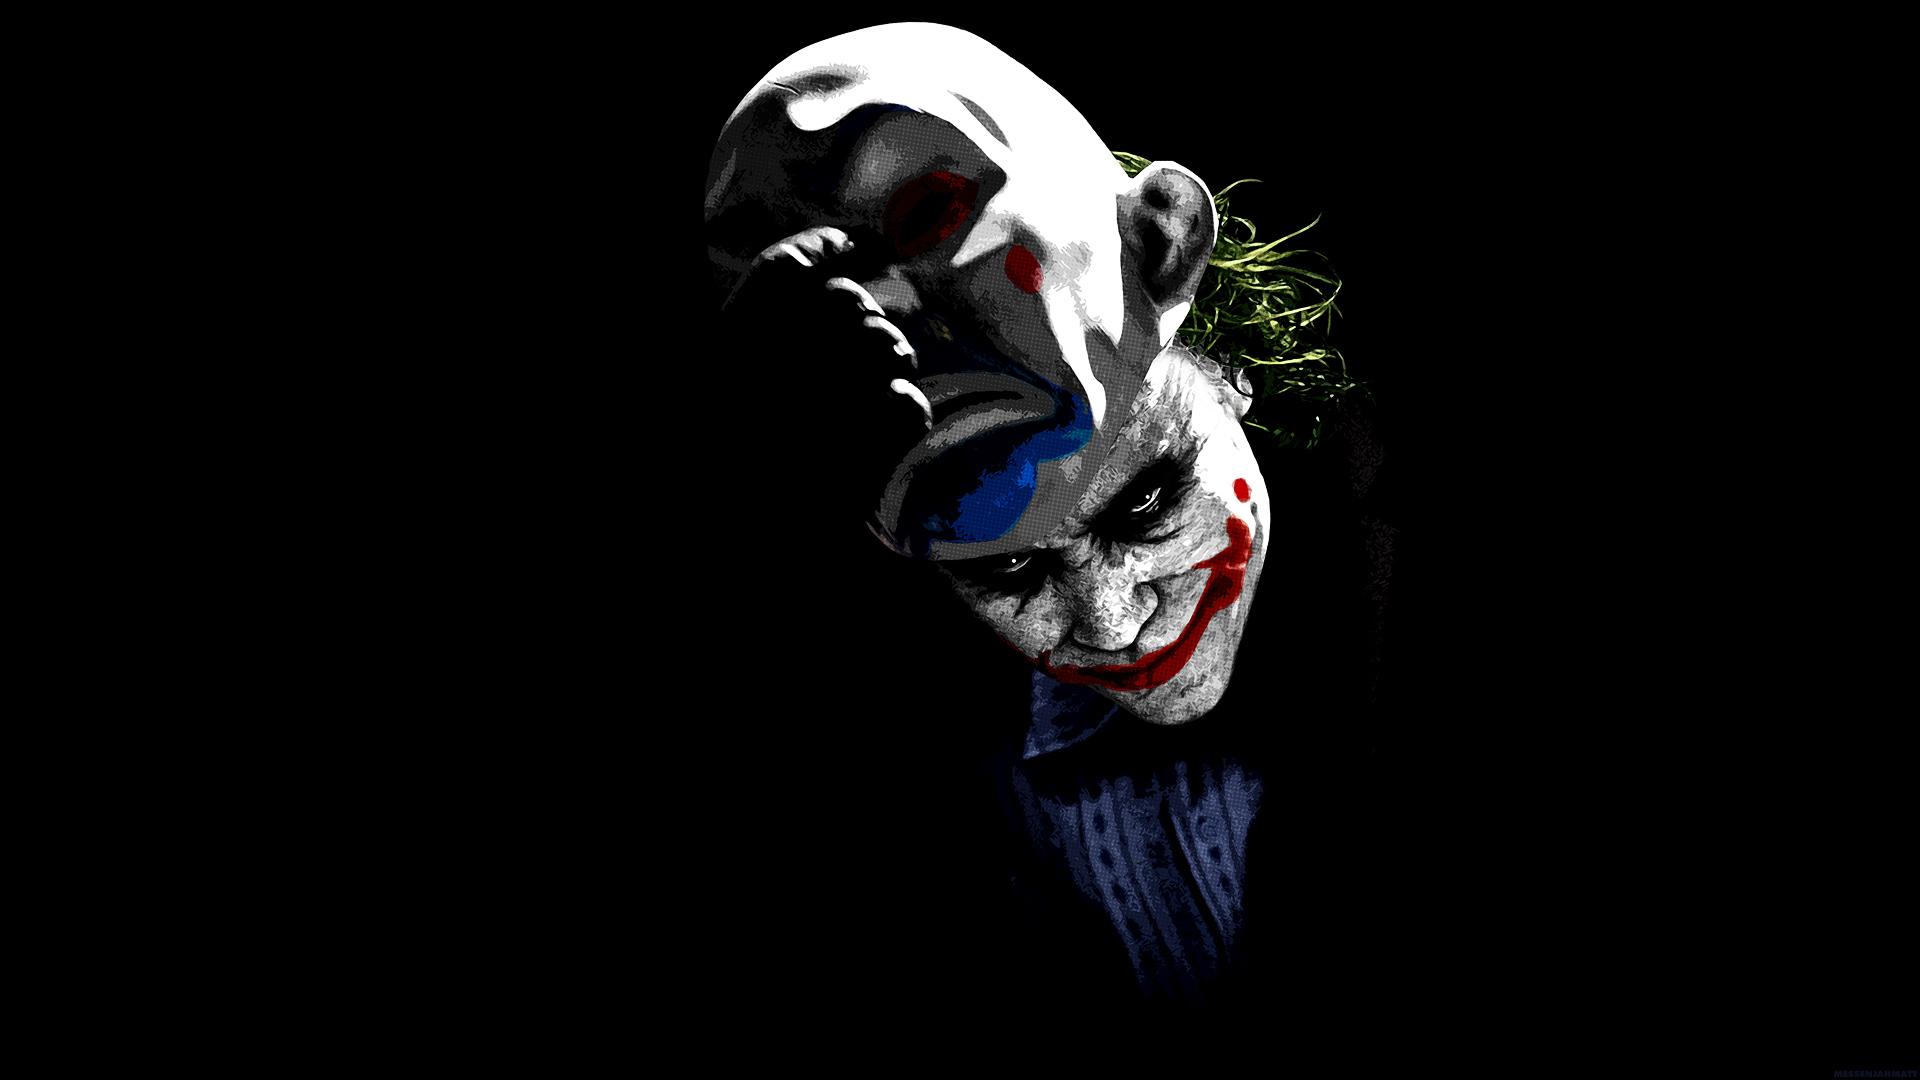 Hd wallpaper of joker - Hd Wallpaper Of Joker 49